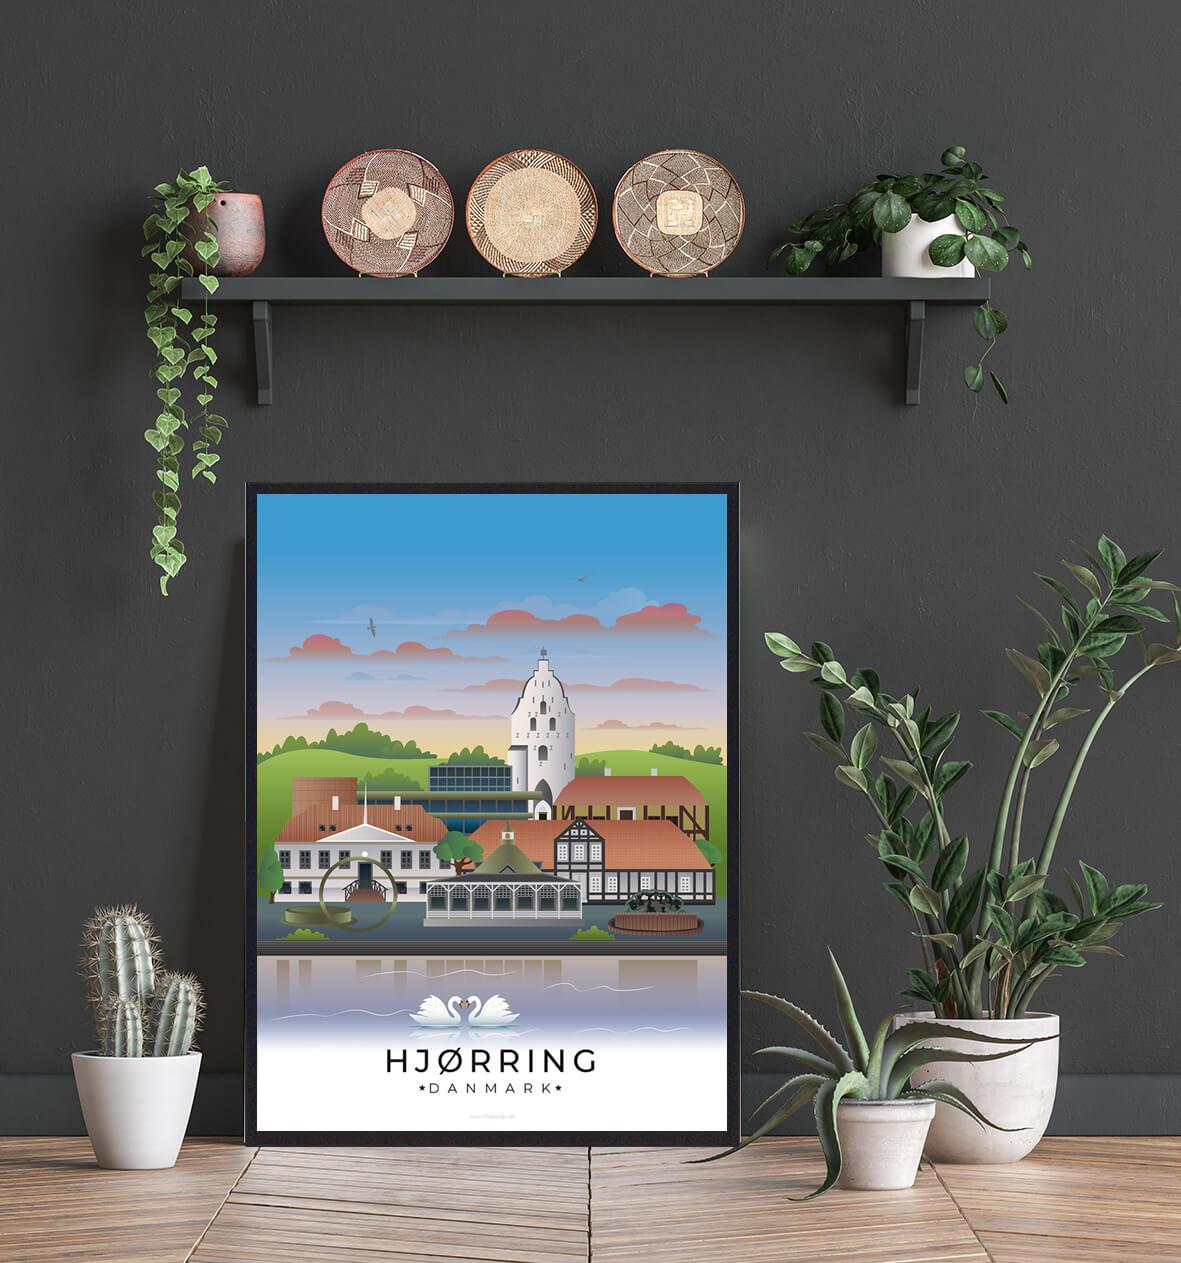 Hjoerring-plakat-boligen